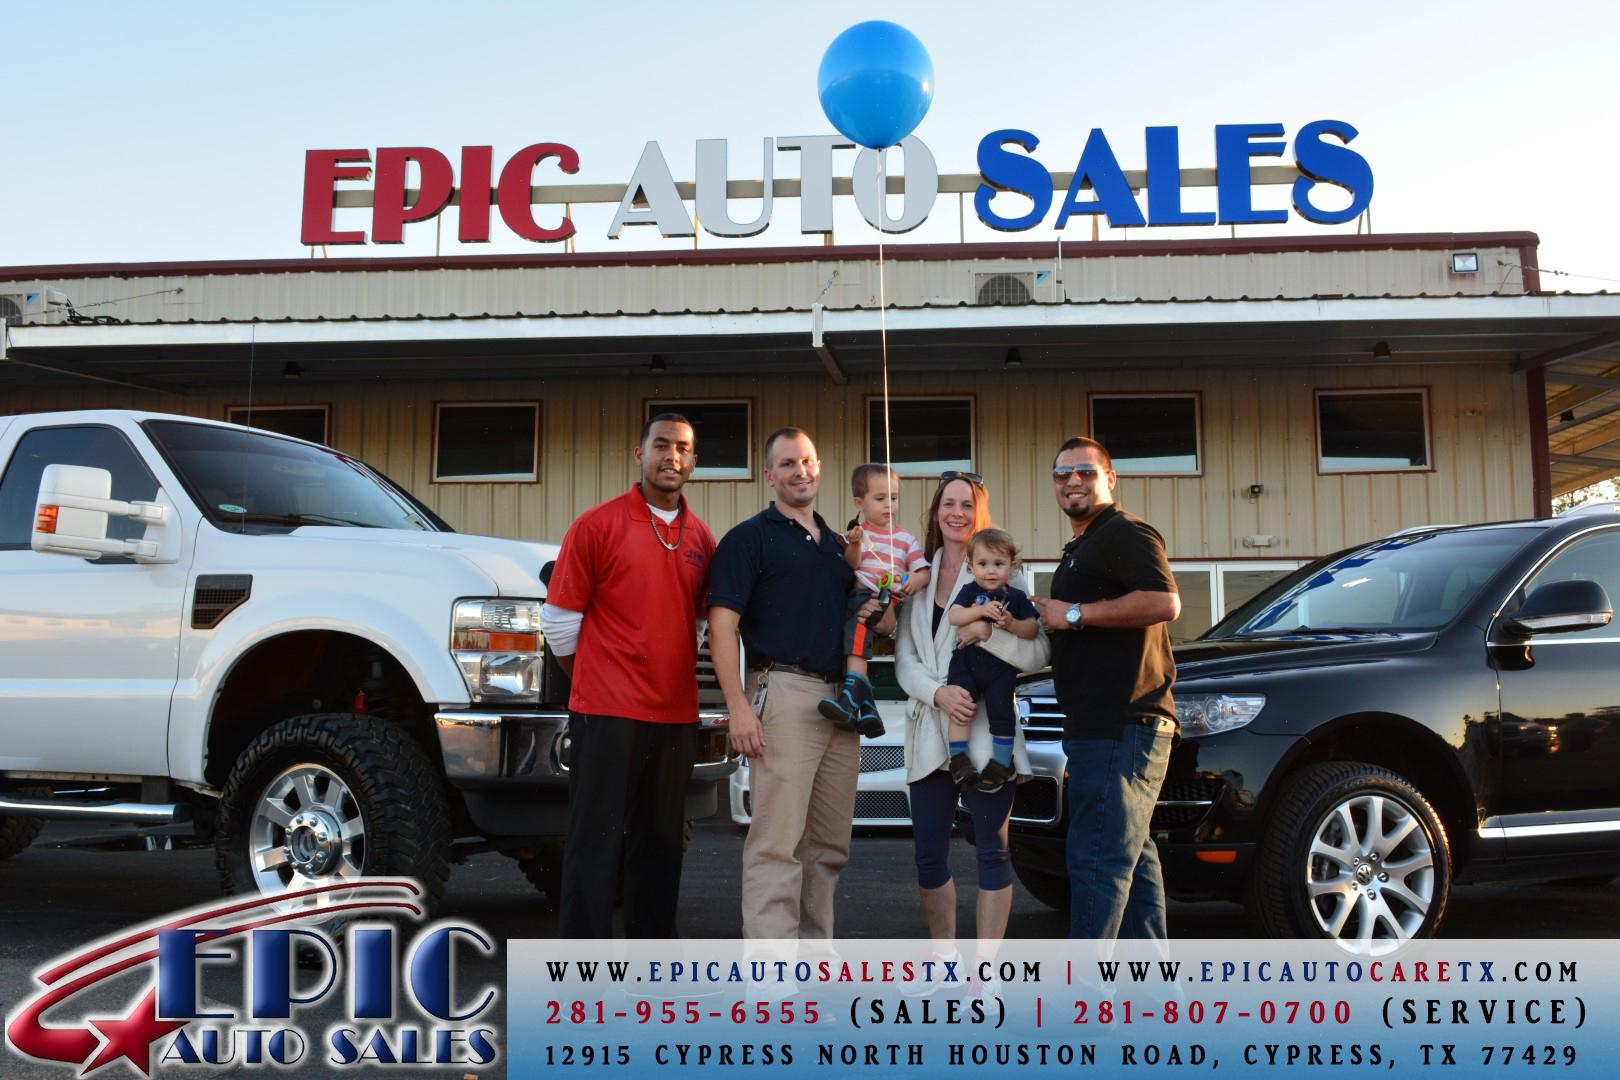 Epic Auto Sales image 15